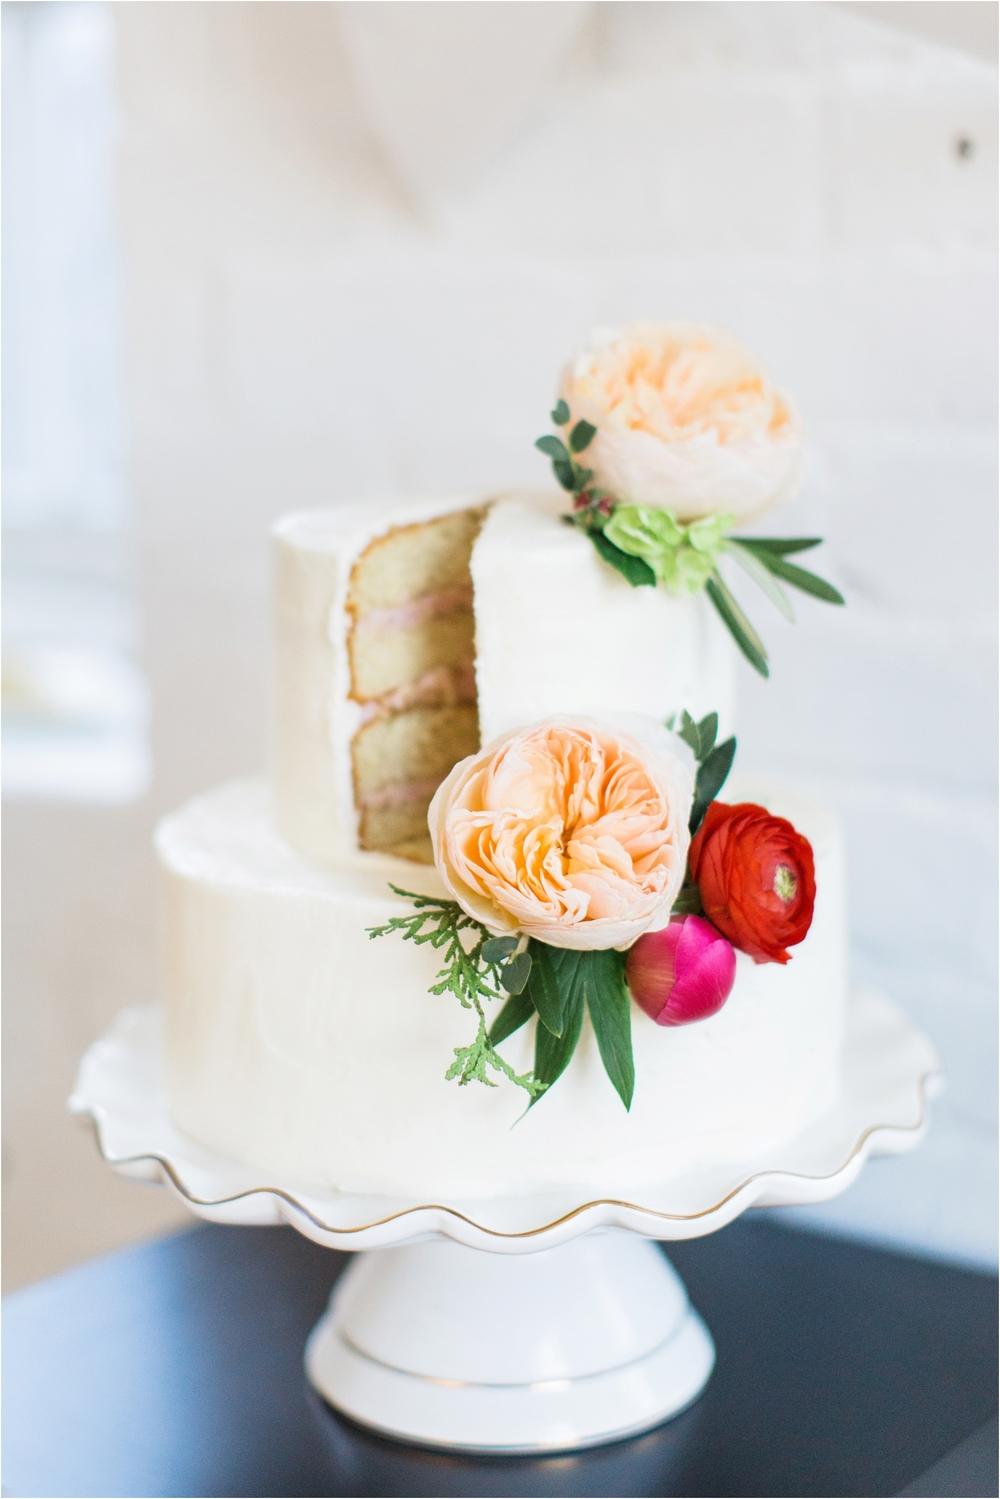 Grand Rapids, MI Bride and Groom Cutting Cake